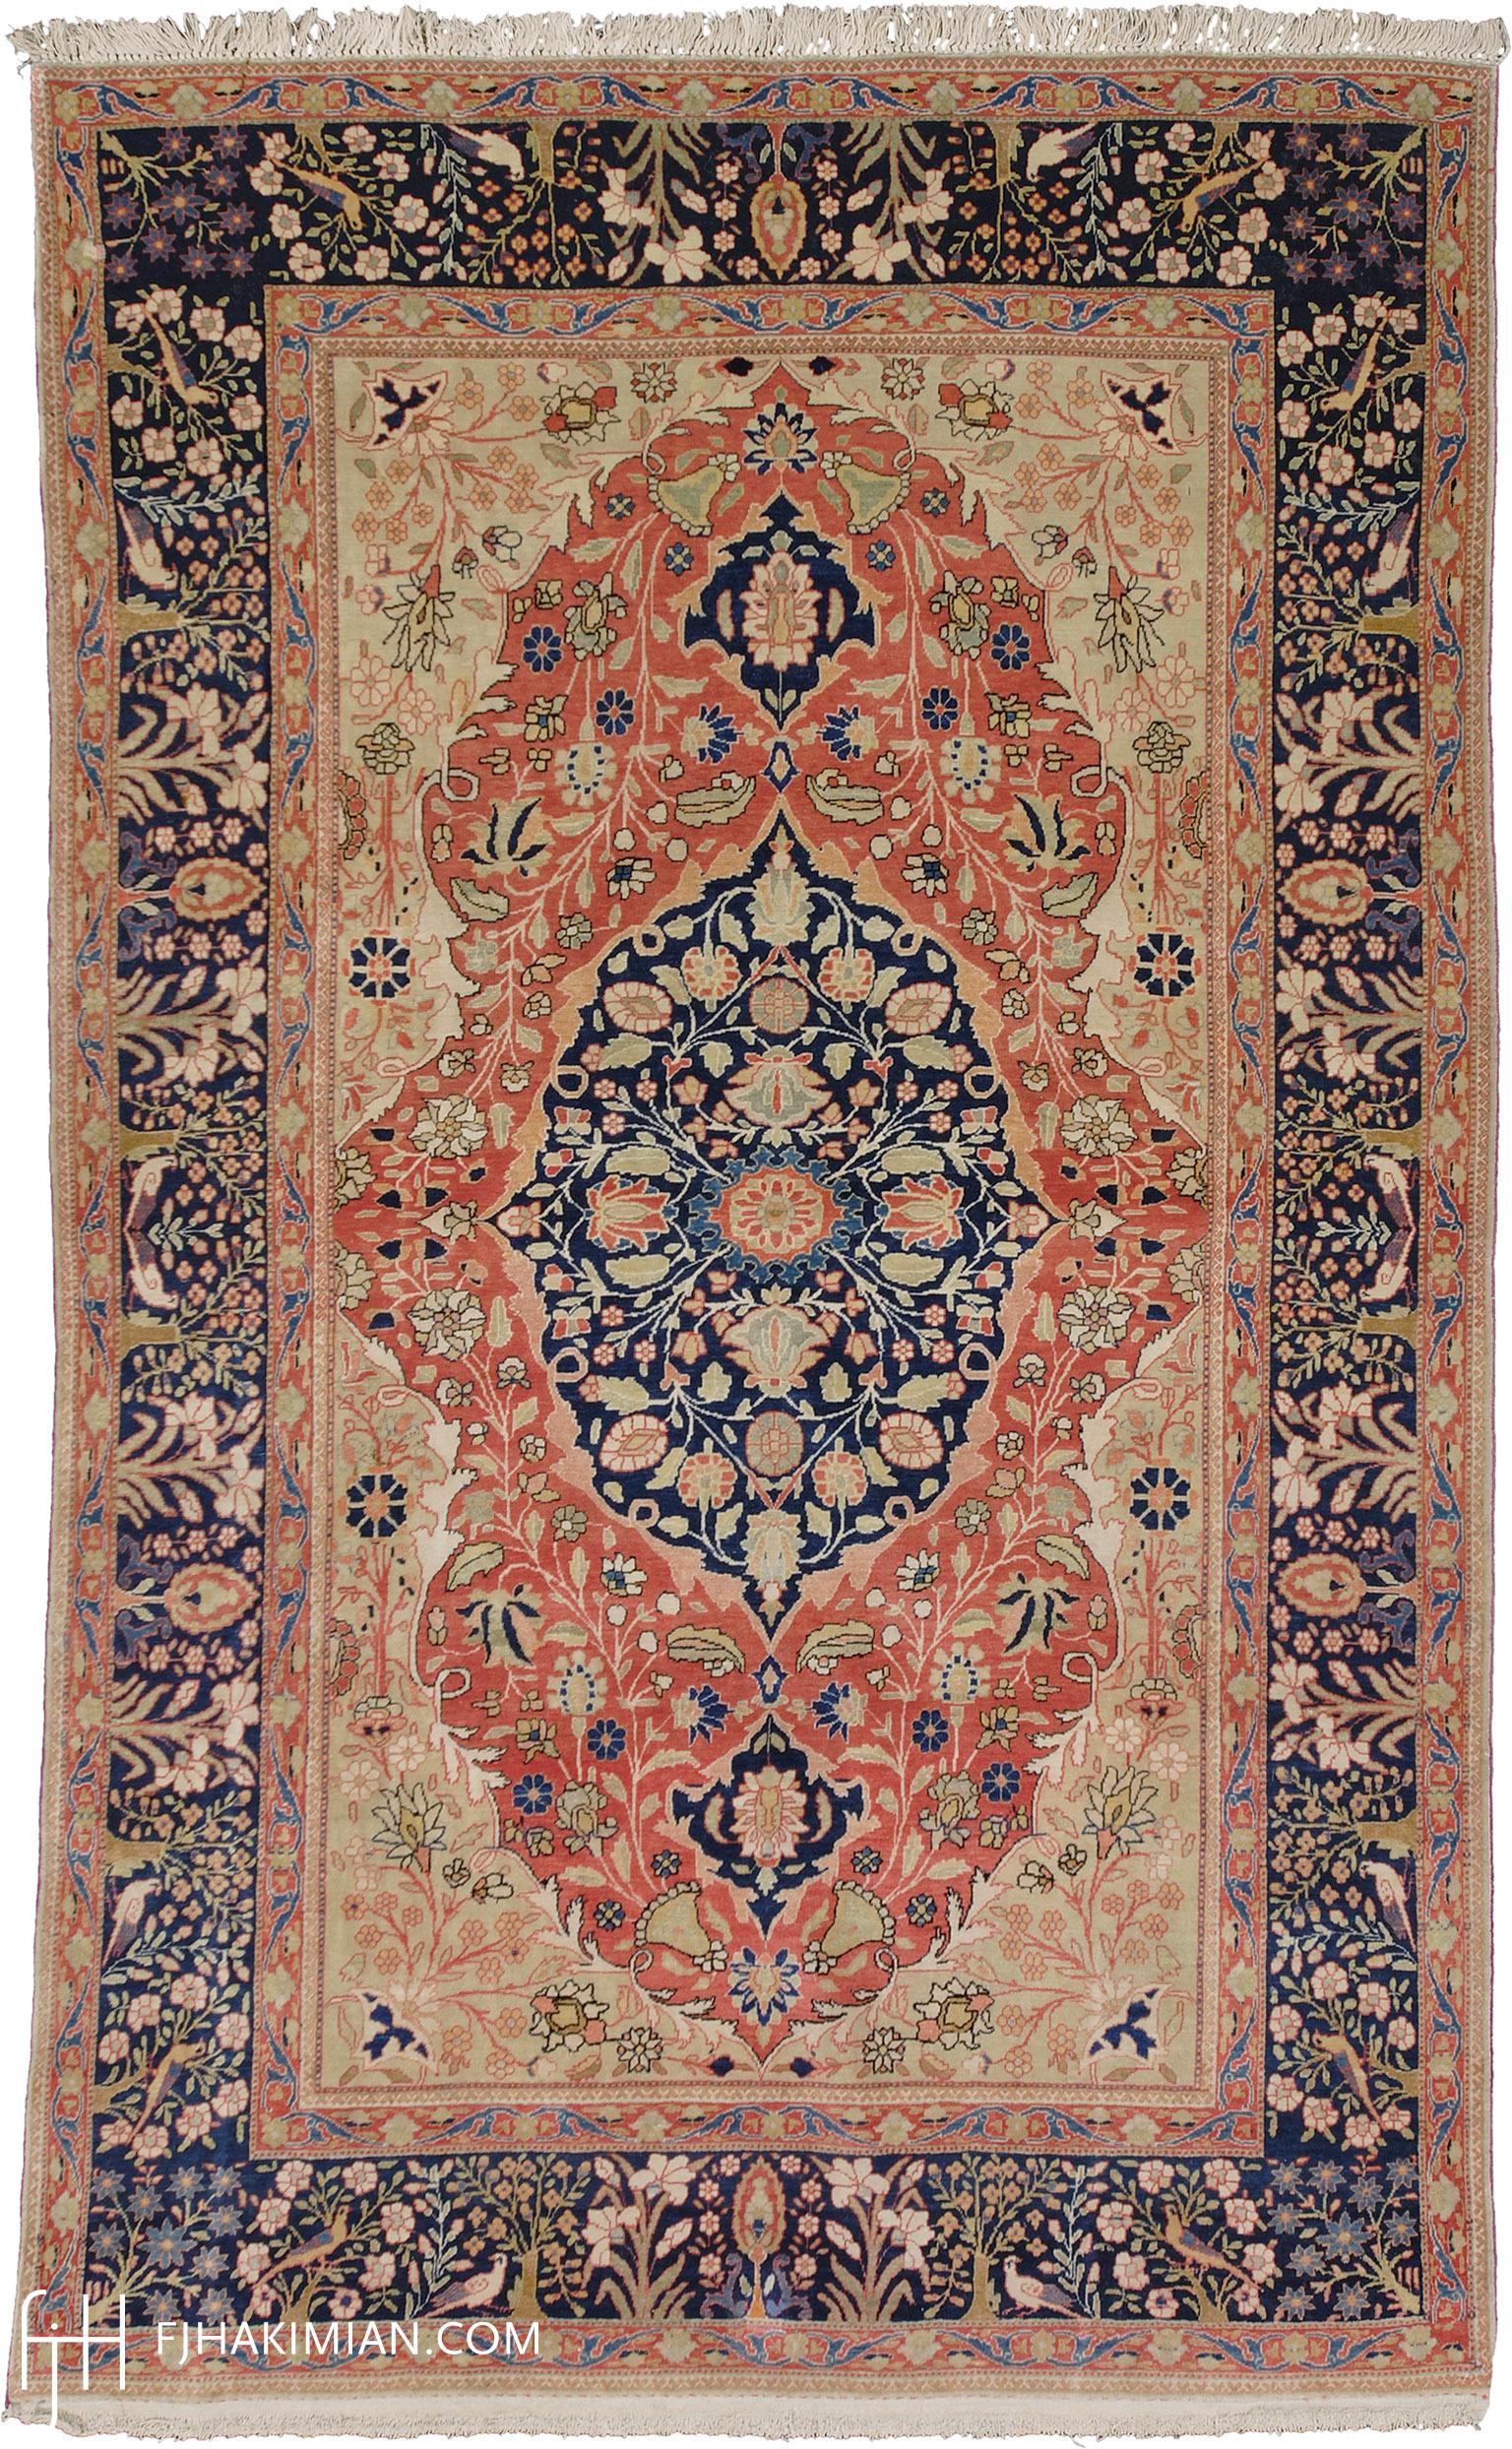 11073 Persian Mohtasham Kashan Rug | FJ Hakimian